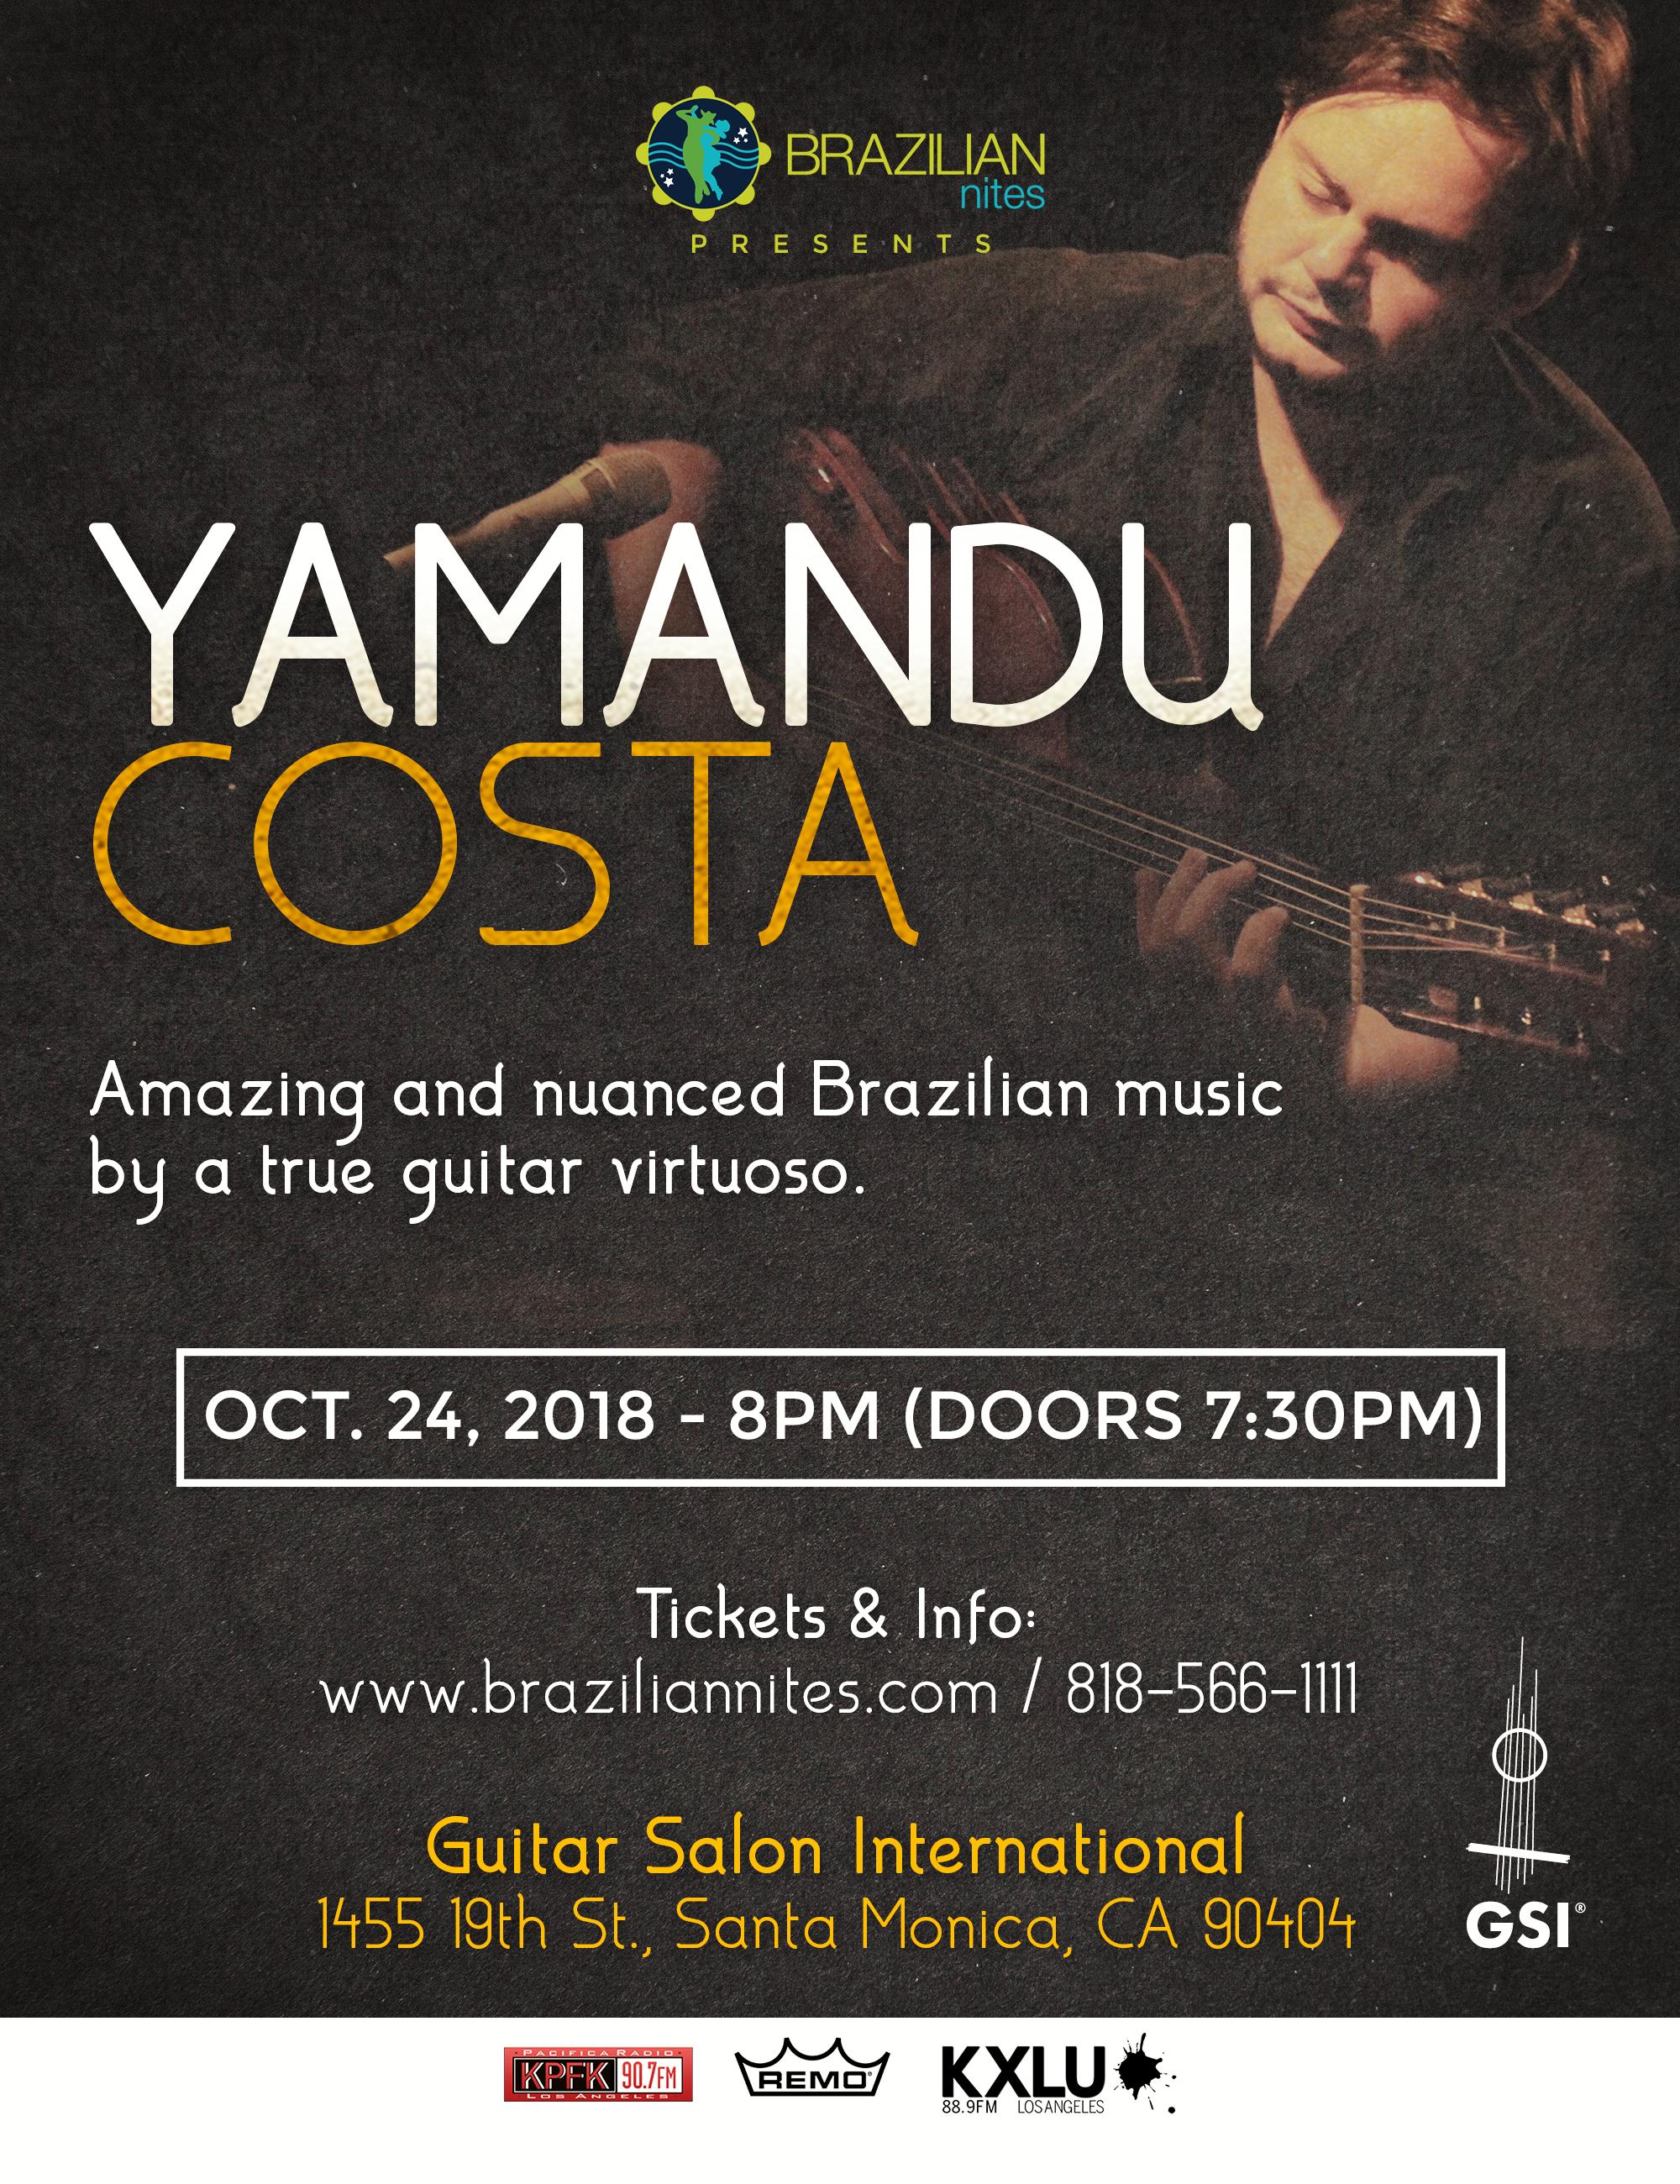 Yamandu Costa - Flyer Oficial.png